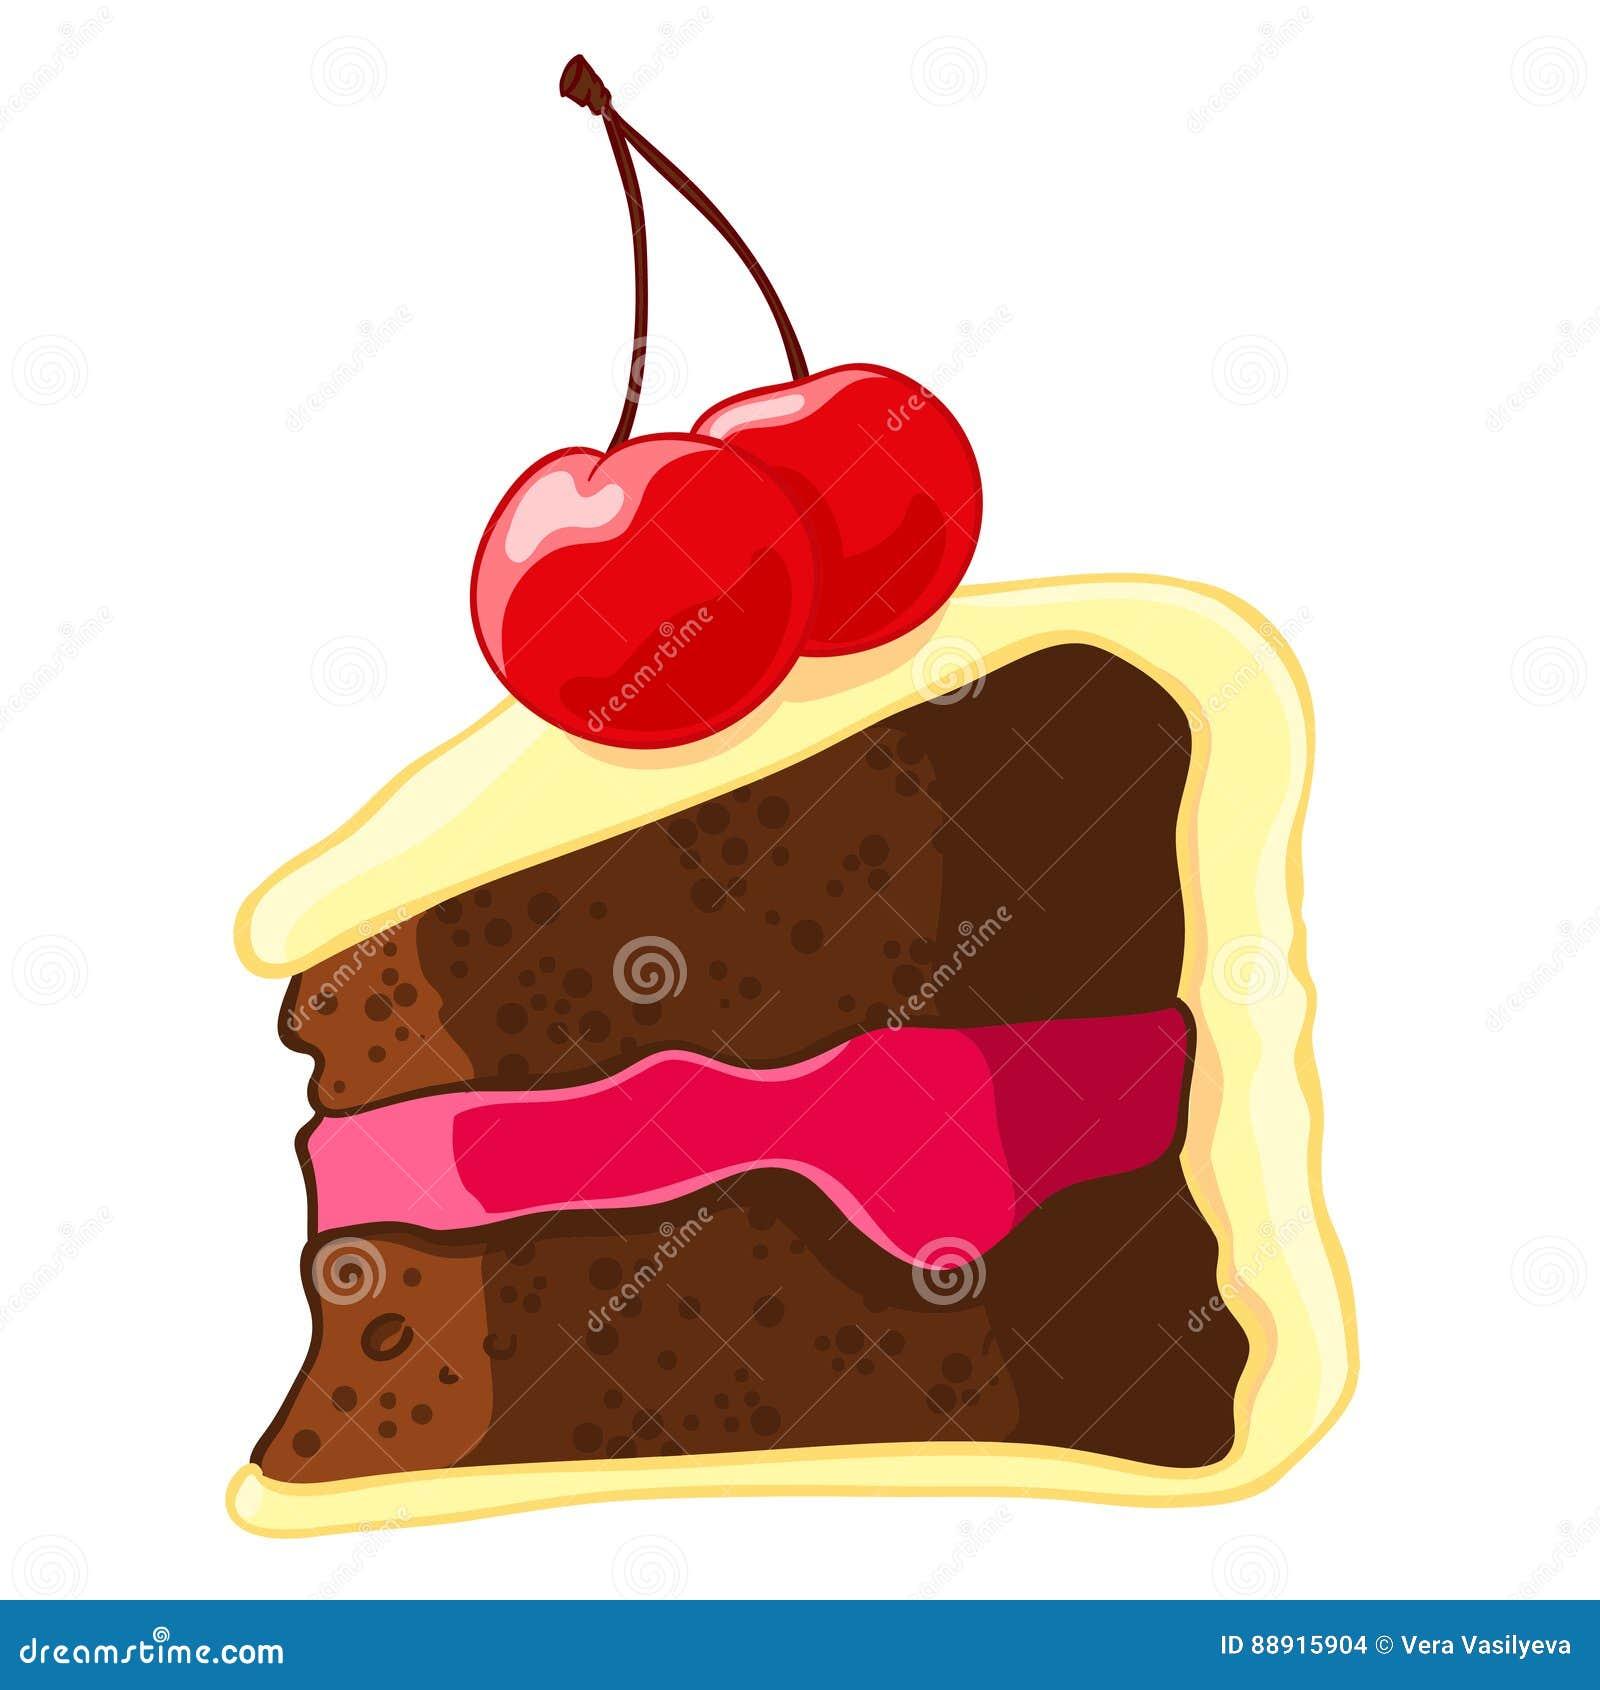 Fruitcake Cartoons Illustrations Amp Vector Stock Images